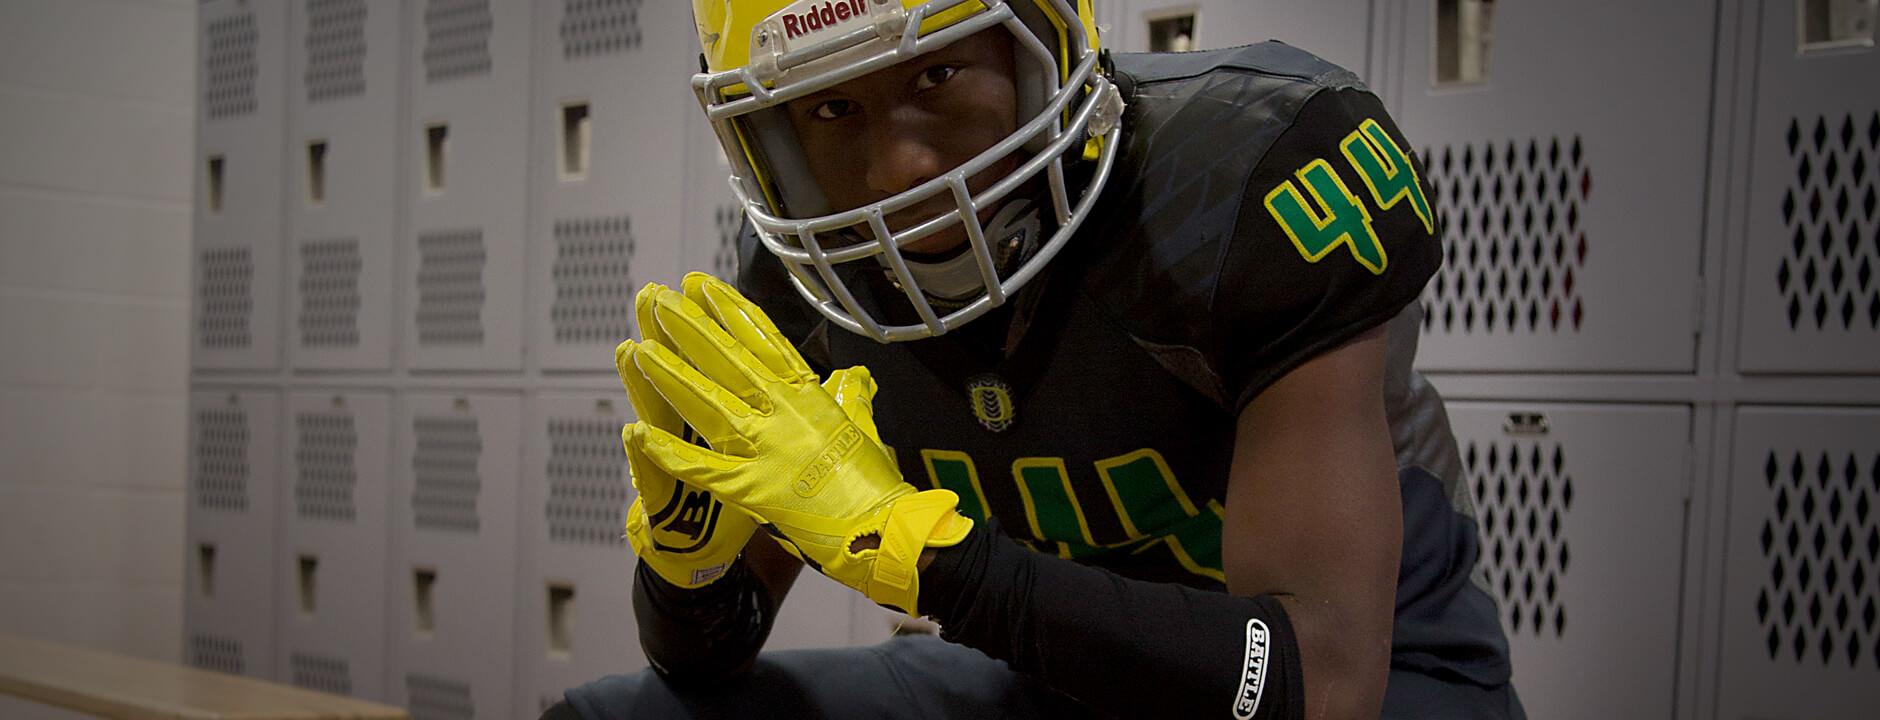 Battle DoubleThreat Football Gloves